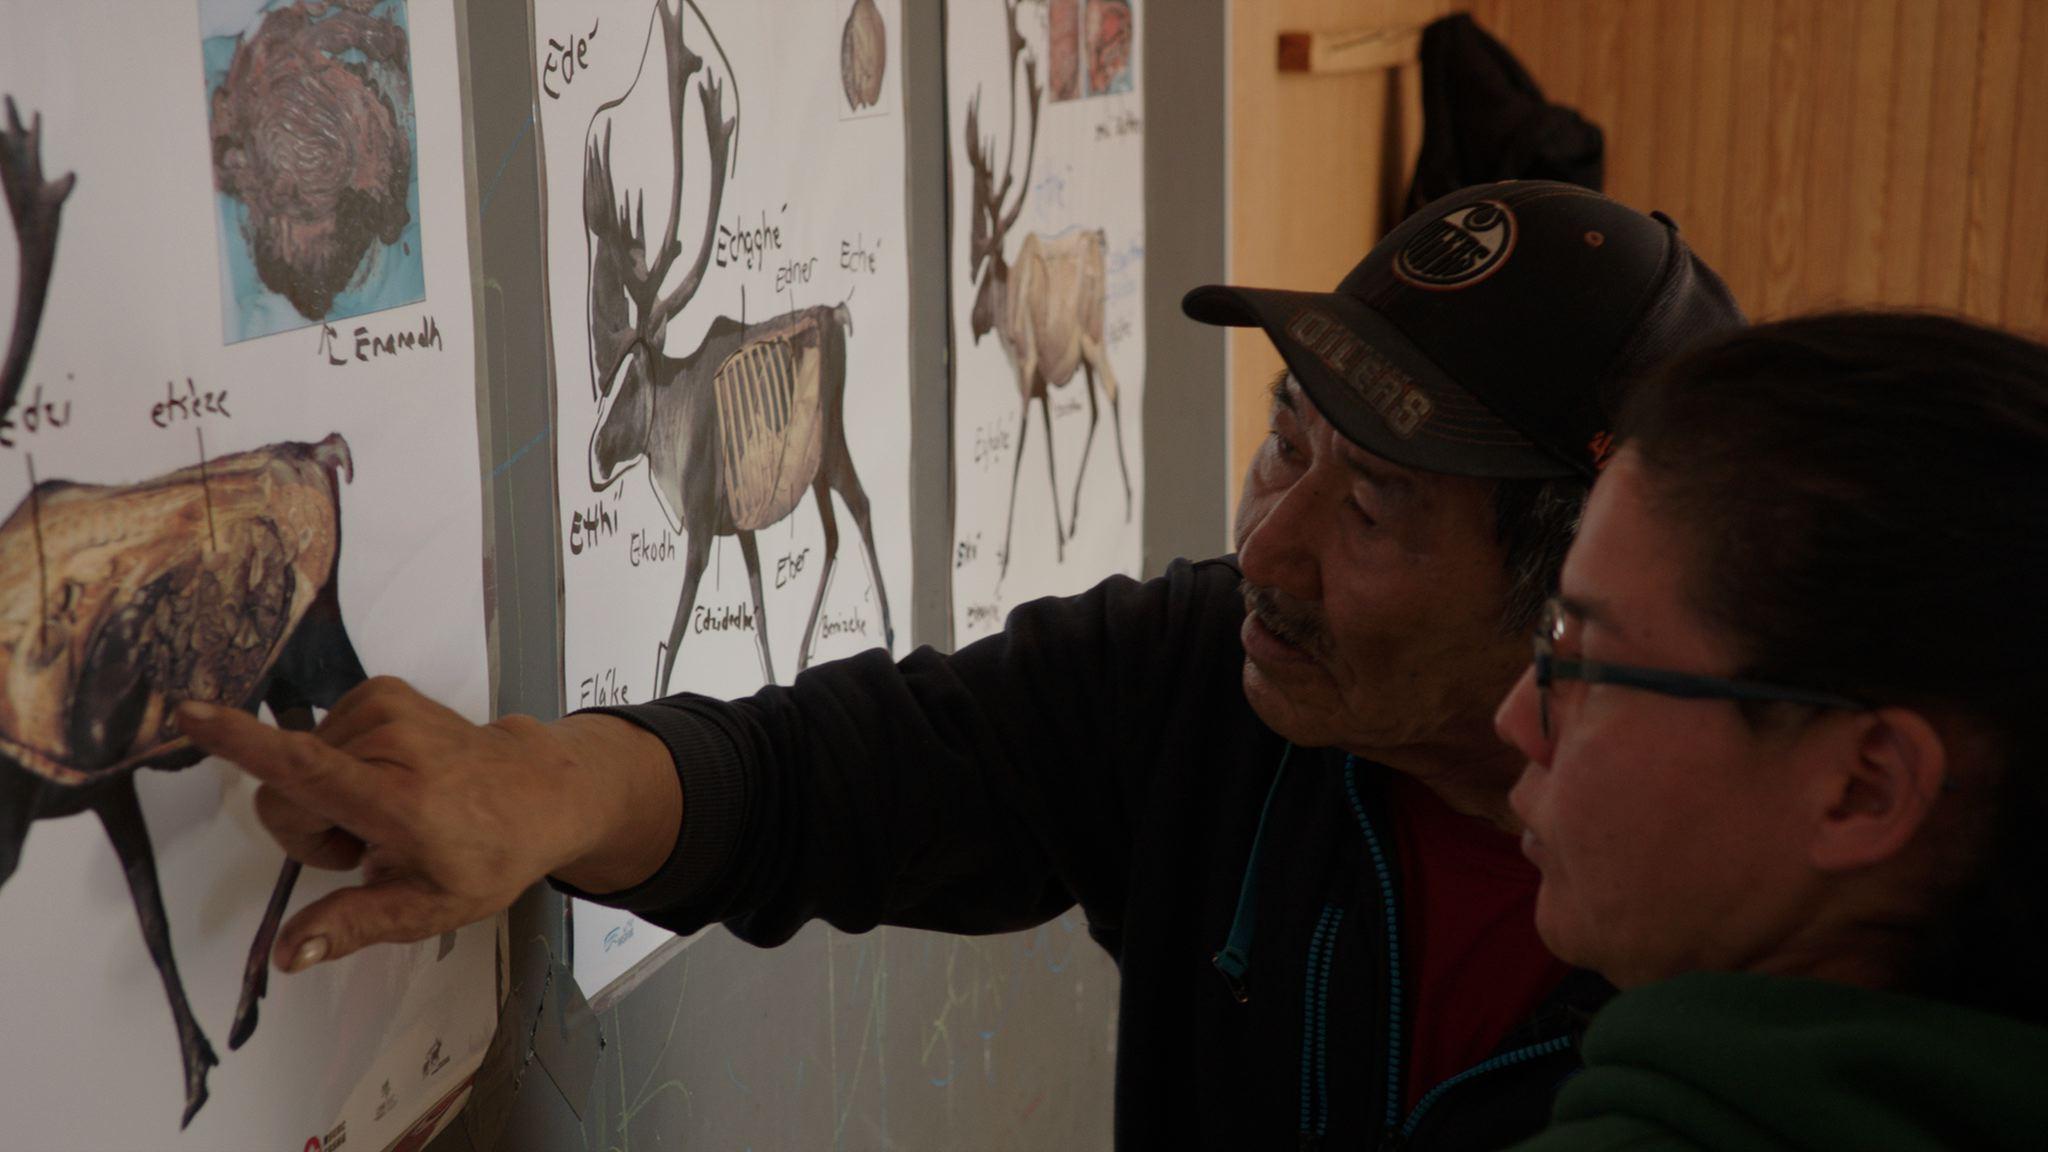 Elders in Wollaston Lake, Saskatchewan teach younger generations about butchering caribou meat.